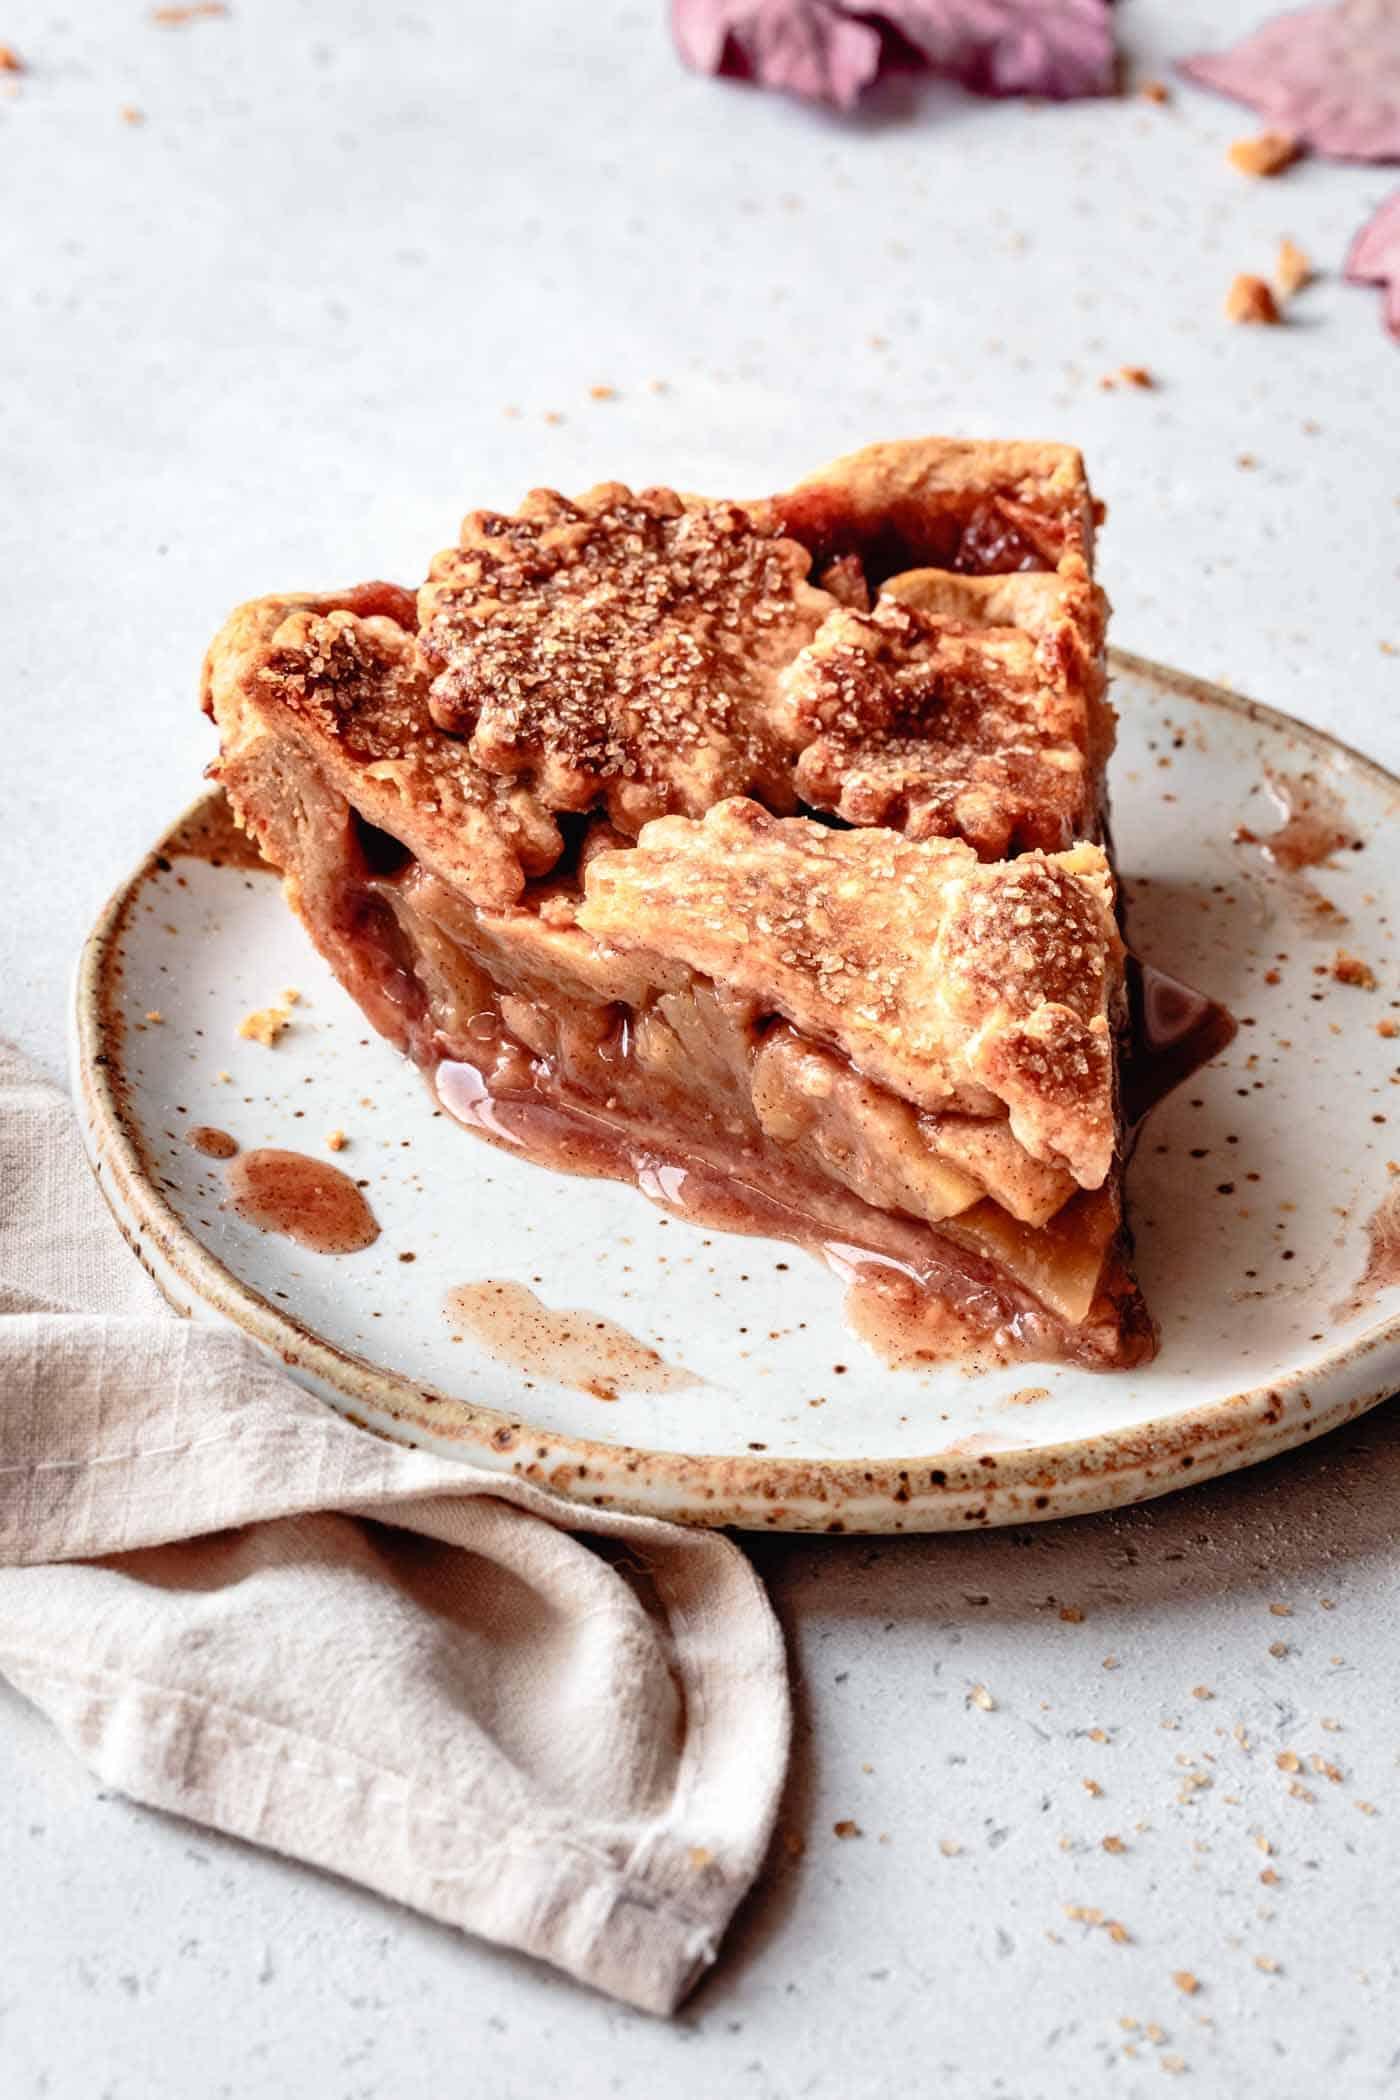 slice of paleo apple pie on a plate